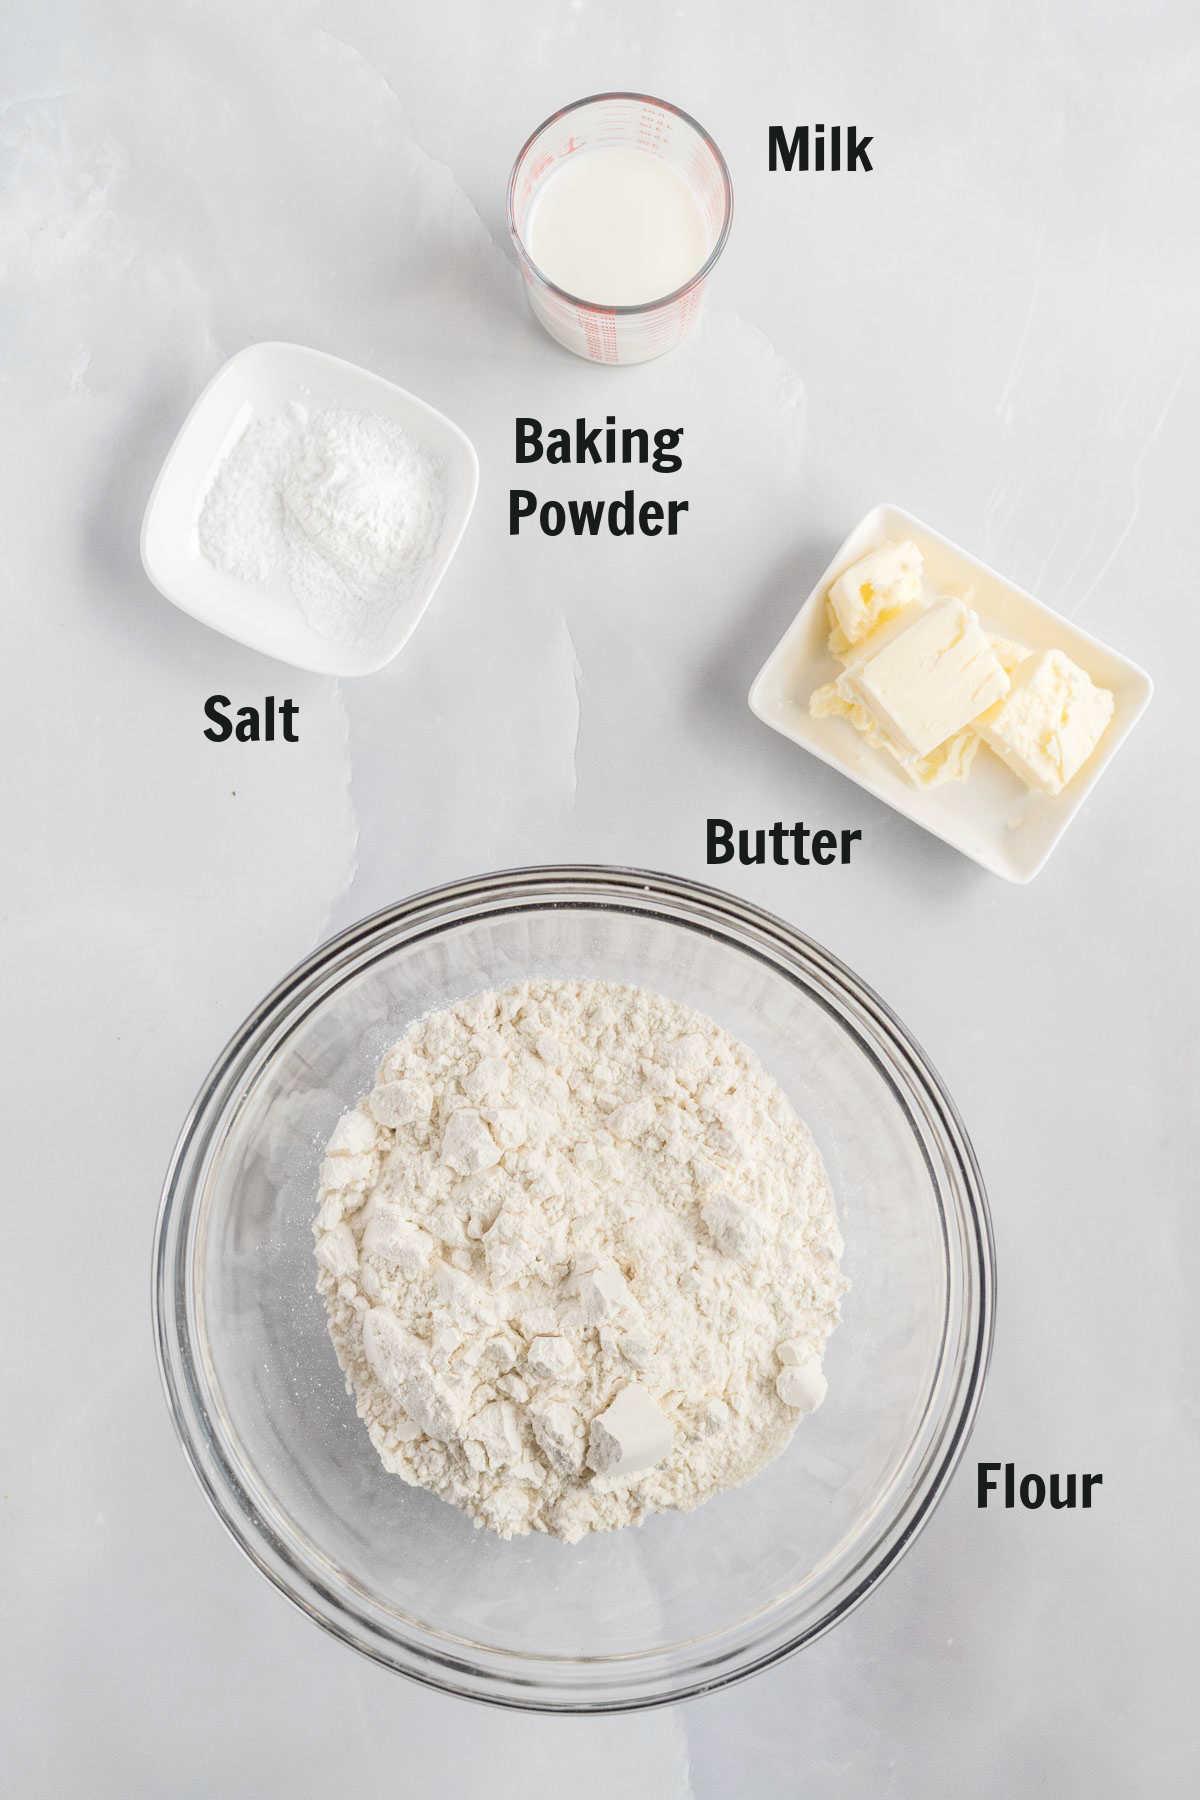 Ingredients for baking powder biscuits.